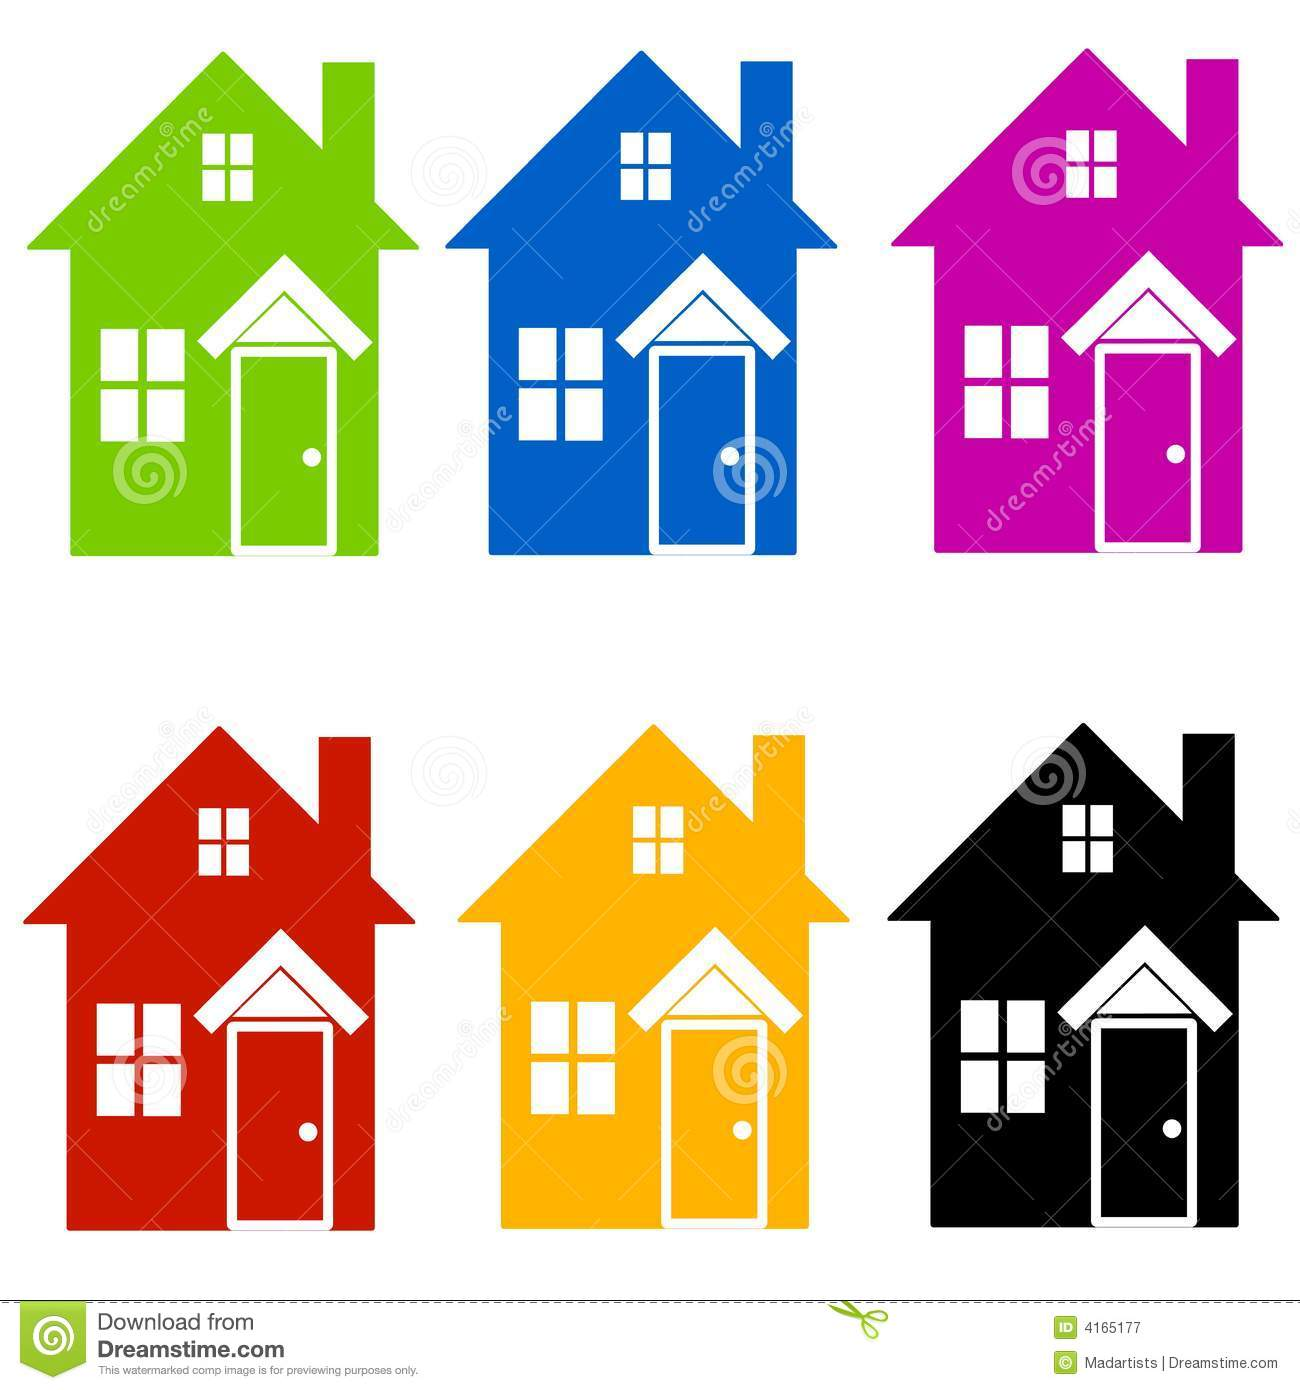 House color clipart.